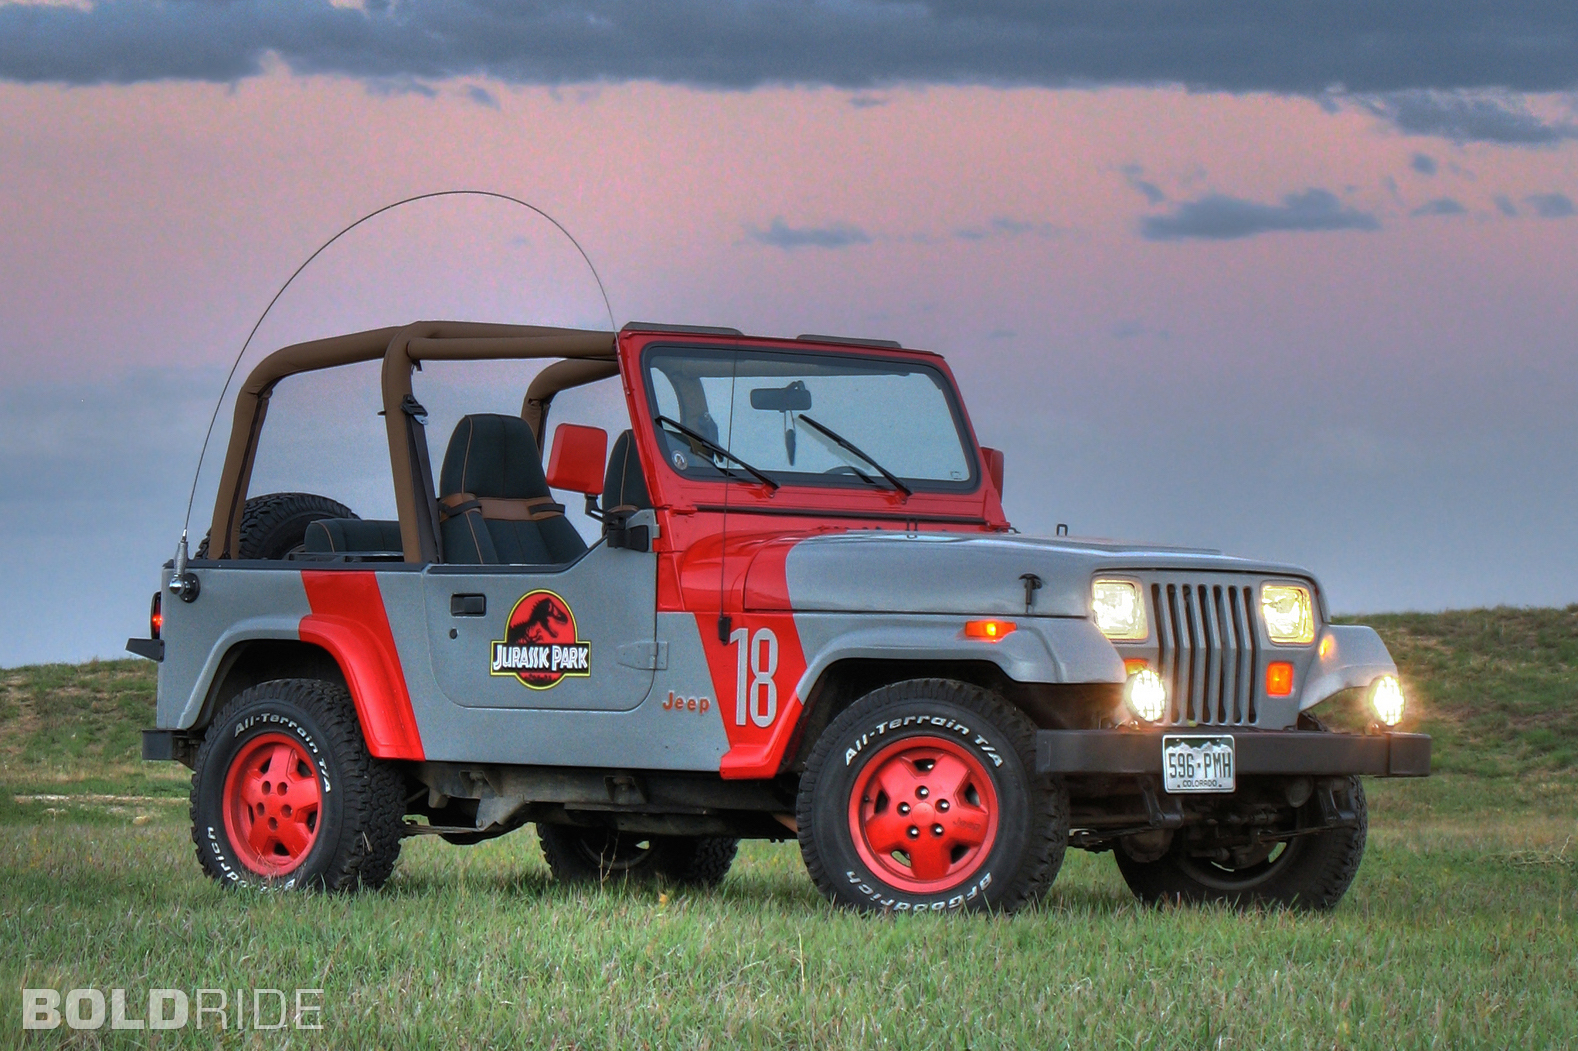 jeep-wrangler-jurassic-park.1578x1051.Jun-10-2015_08.35.14.480196